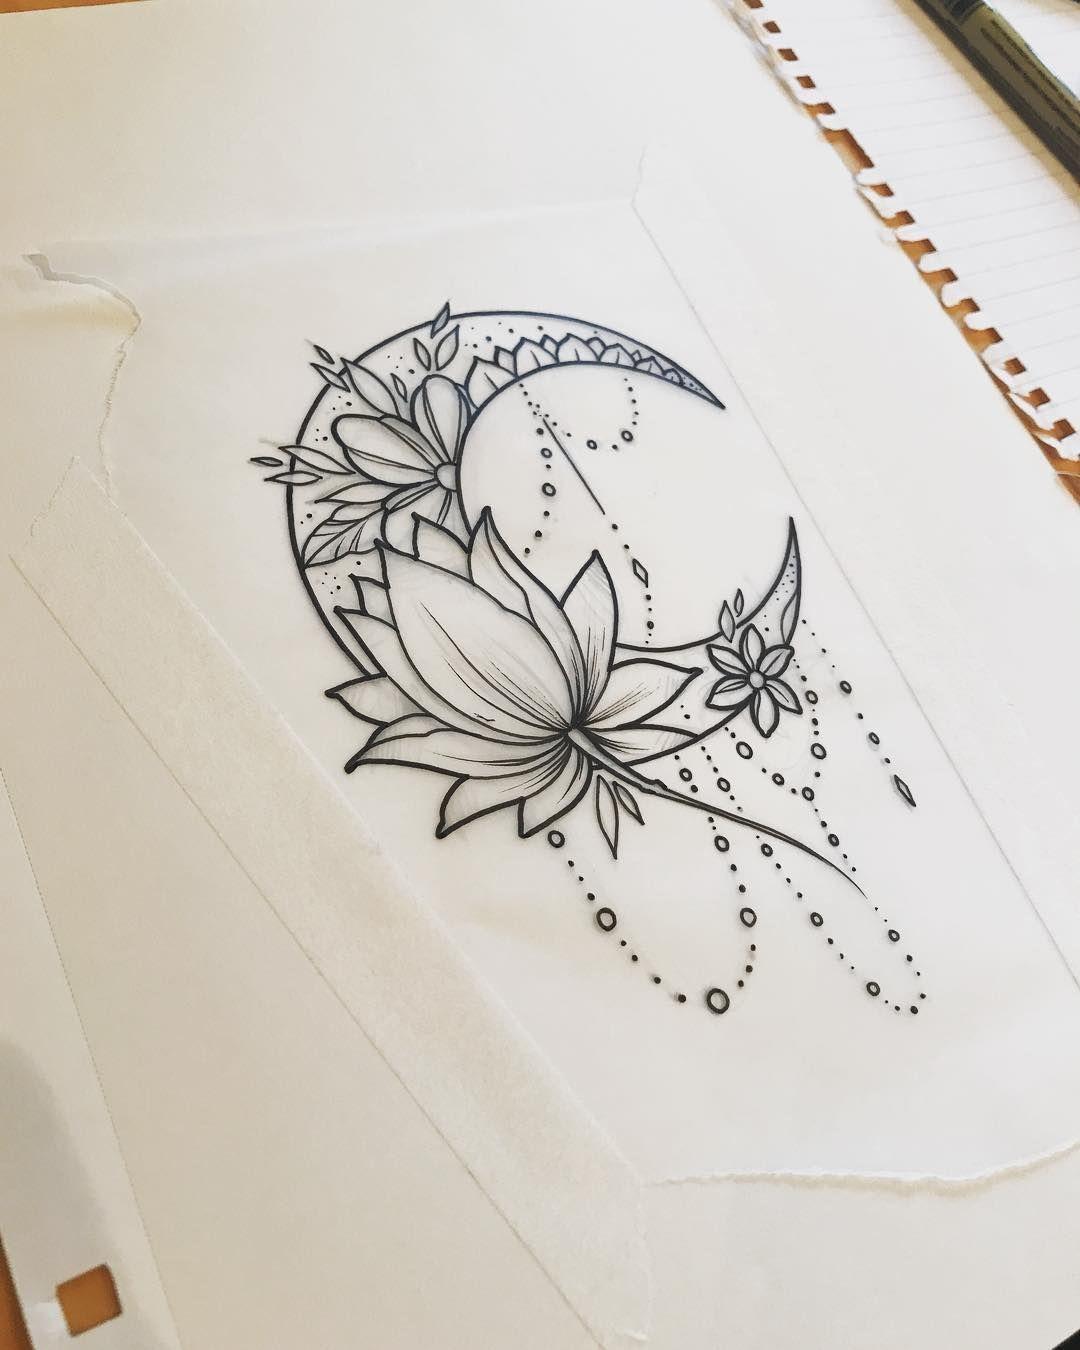 Moon Moontattoo Lotus Lotustattoo Girltattoo Beautytatoos In 2020 Moon Tattoo Designs Flower Tattoo Designs Mandala Tattoo Design